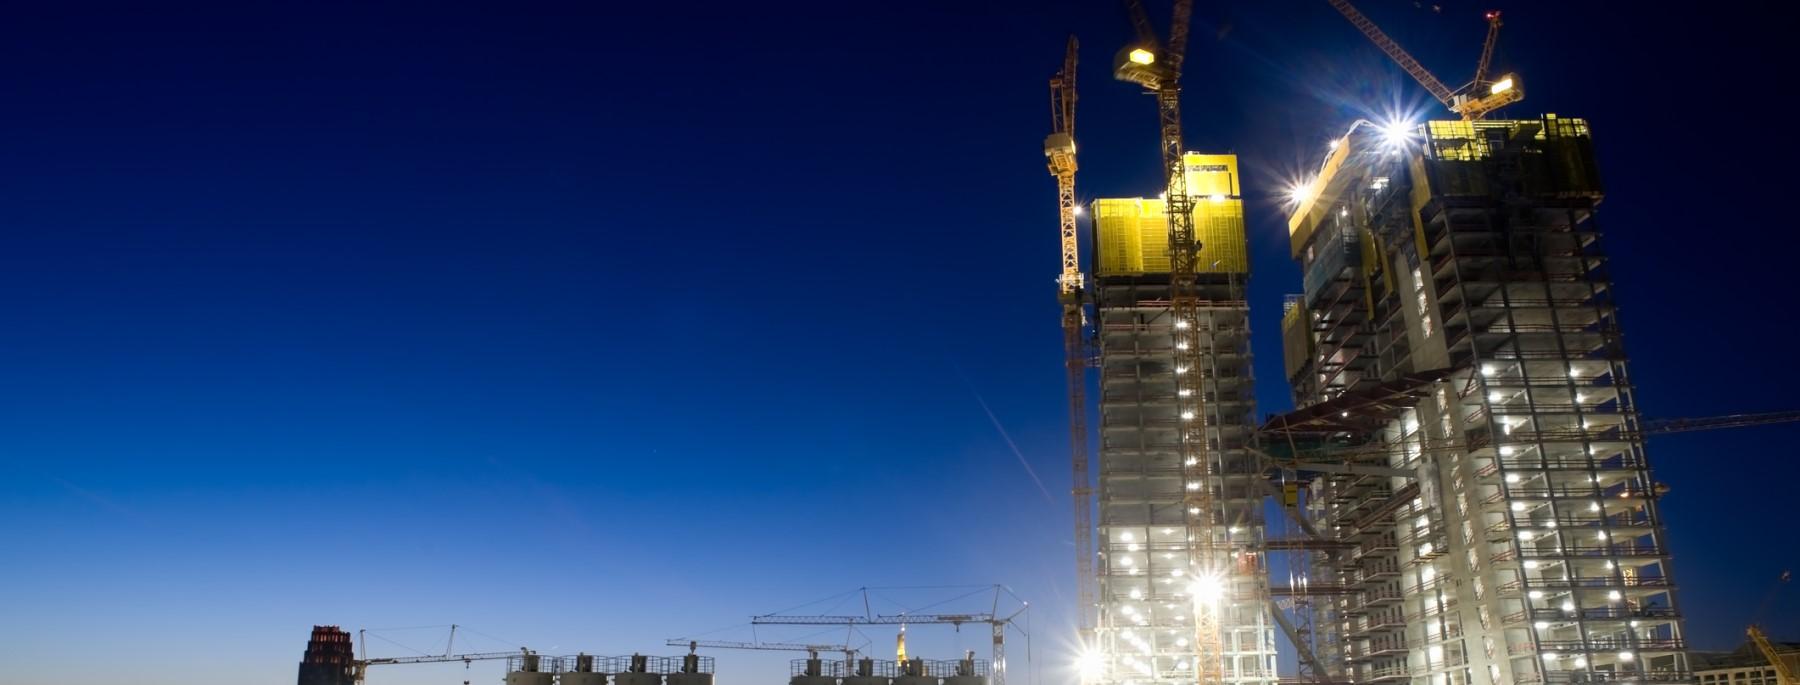 Baustellenbewachung in Mannheim